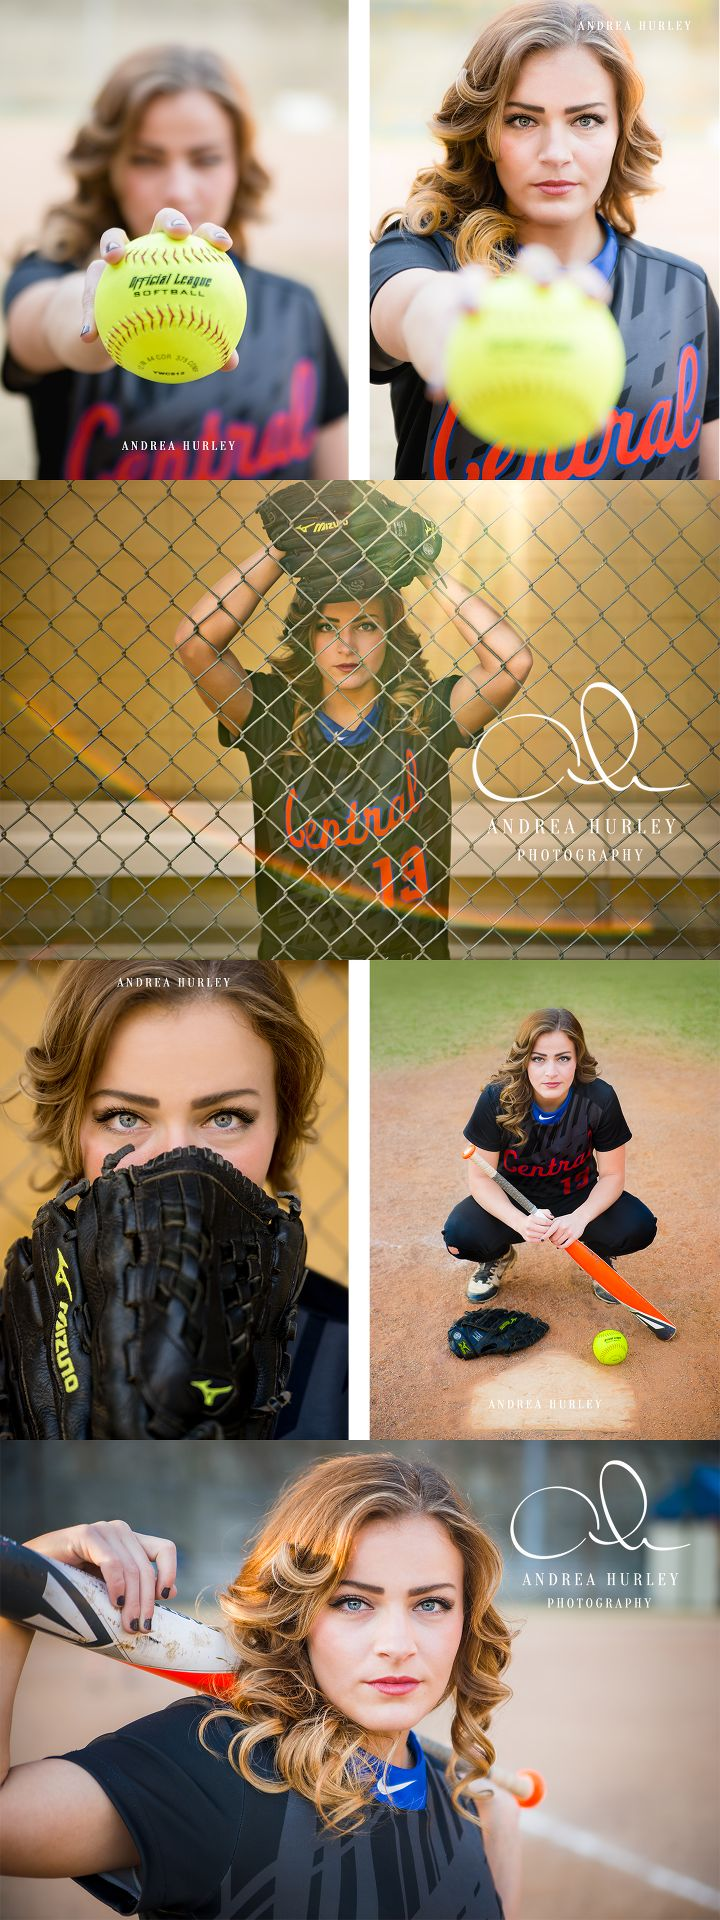 Senior Softball Photos; Senior Posing, Girls Softball. #kentuckyphotographer #sportsphotos